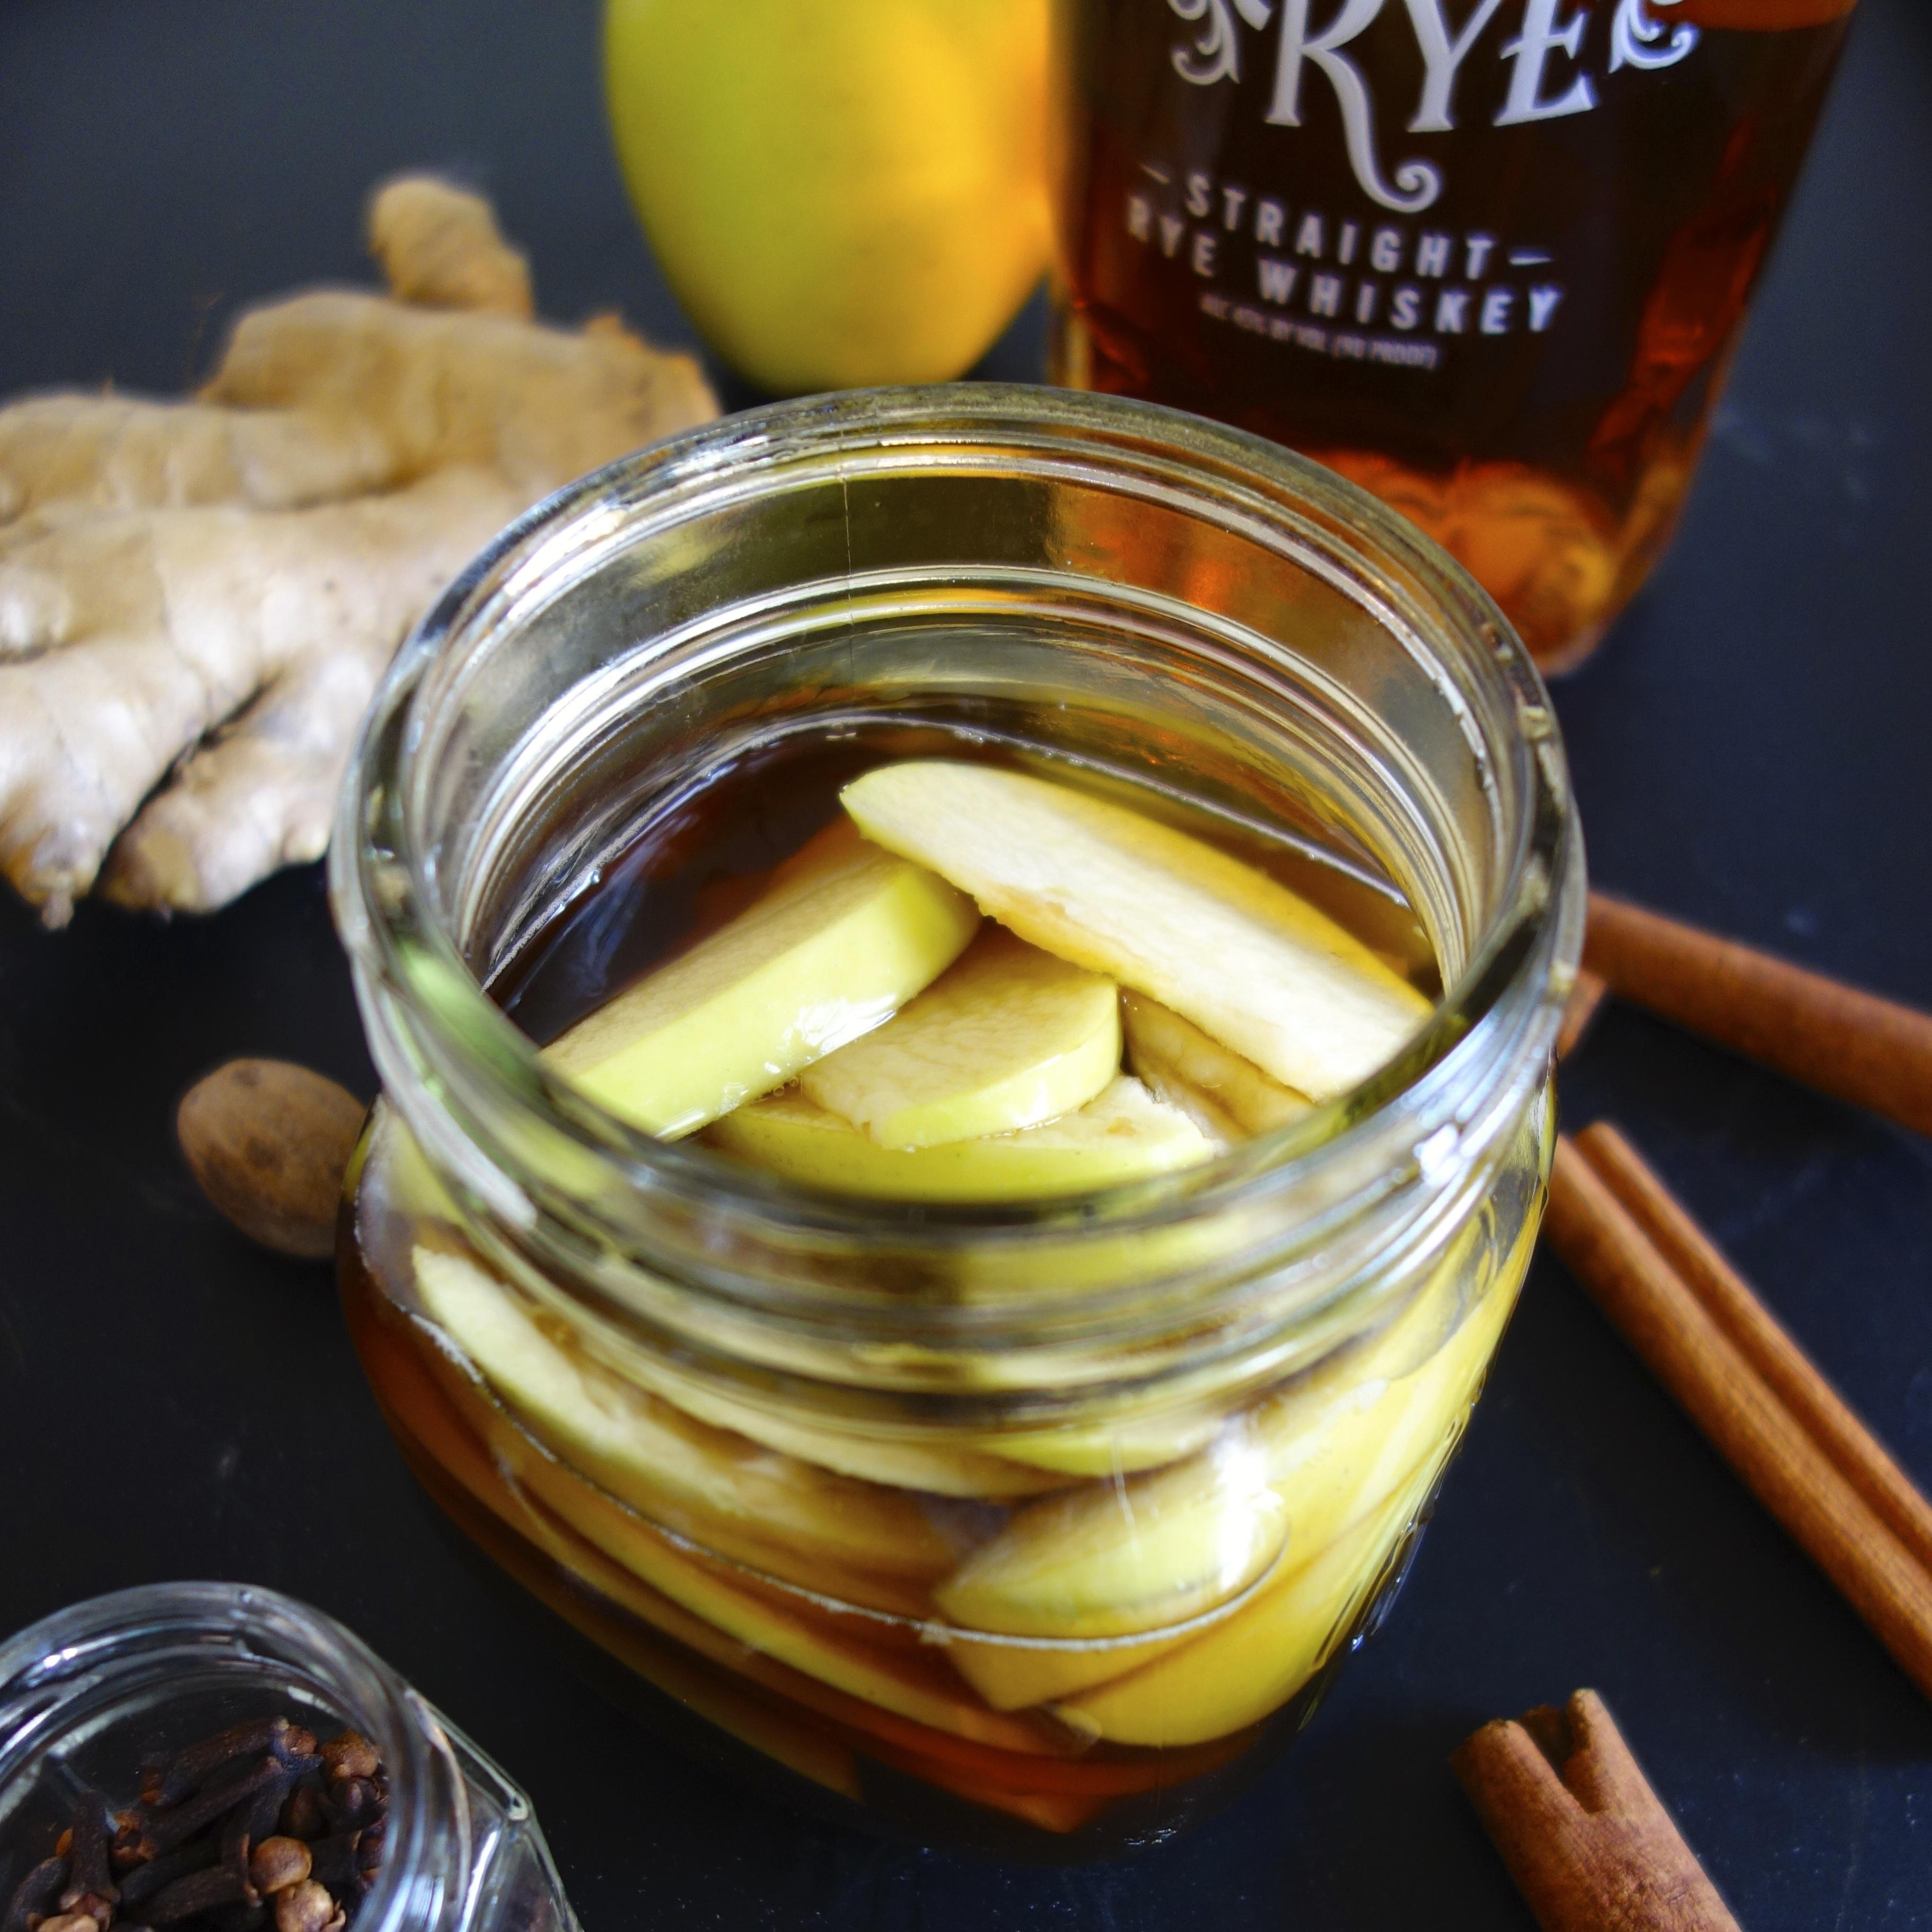 Apple-Spiced Rye